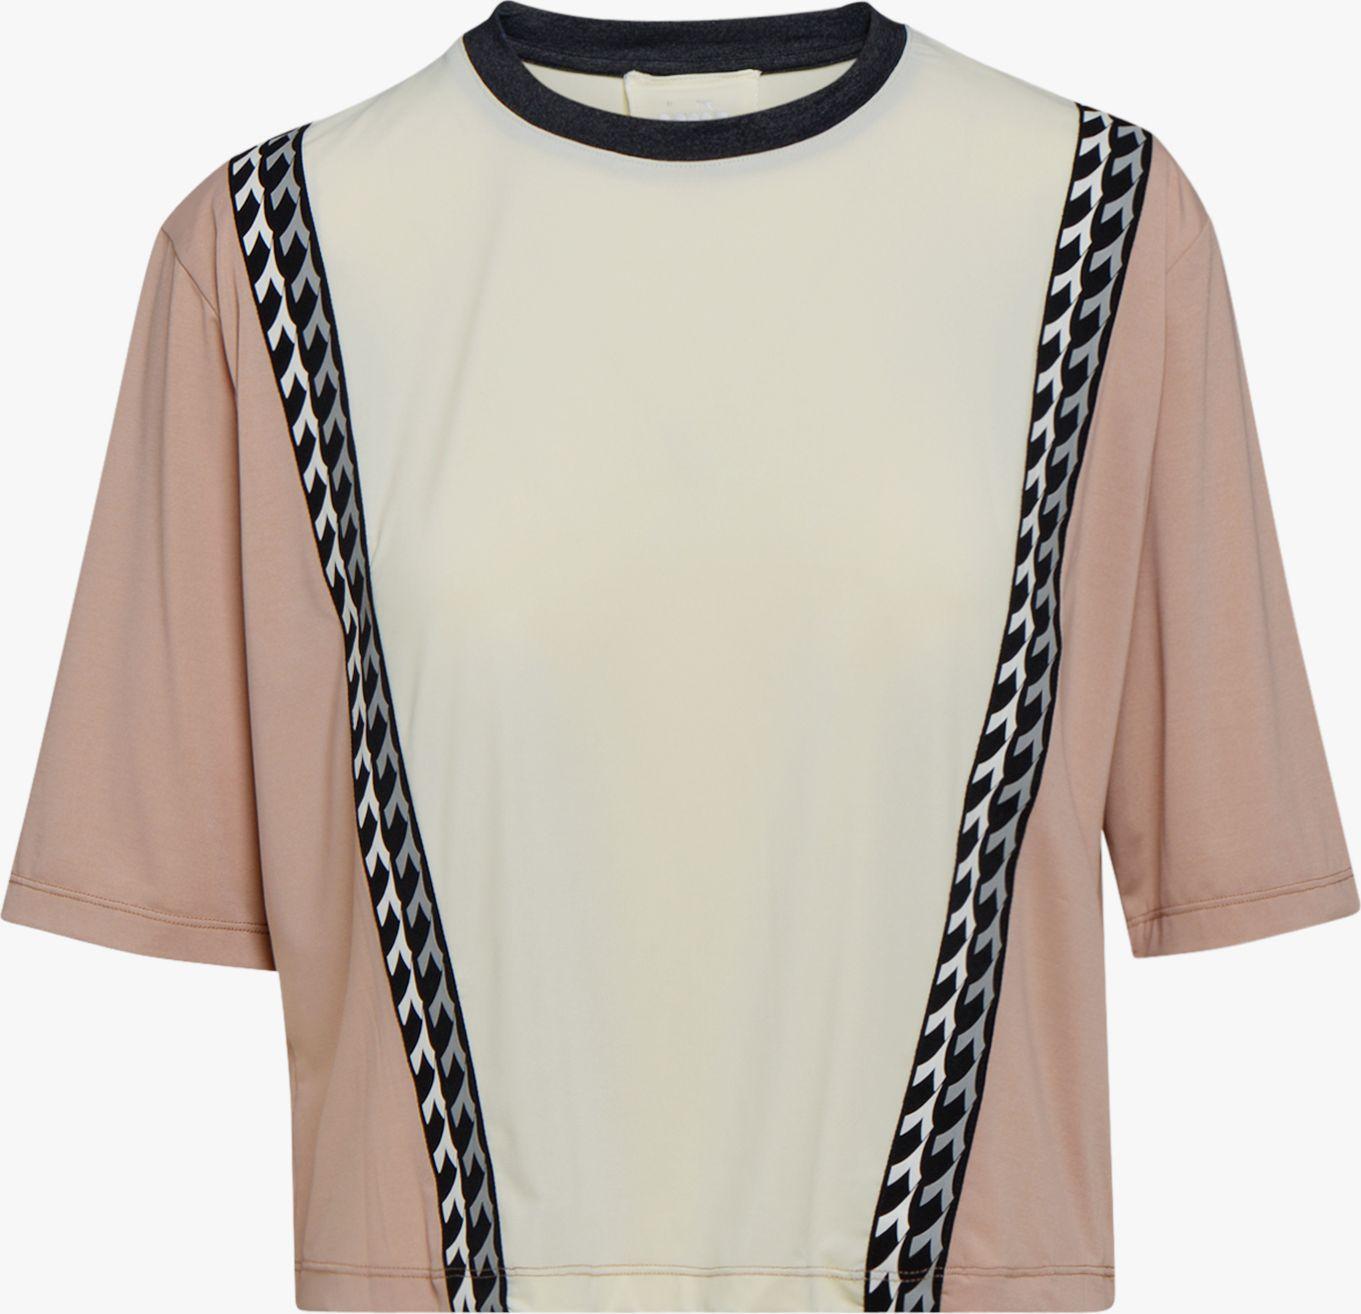 DIADORA L. SS T-Shirt Be One Tech Mahogany Rose/Whisper White L